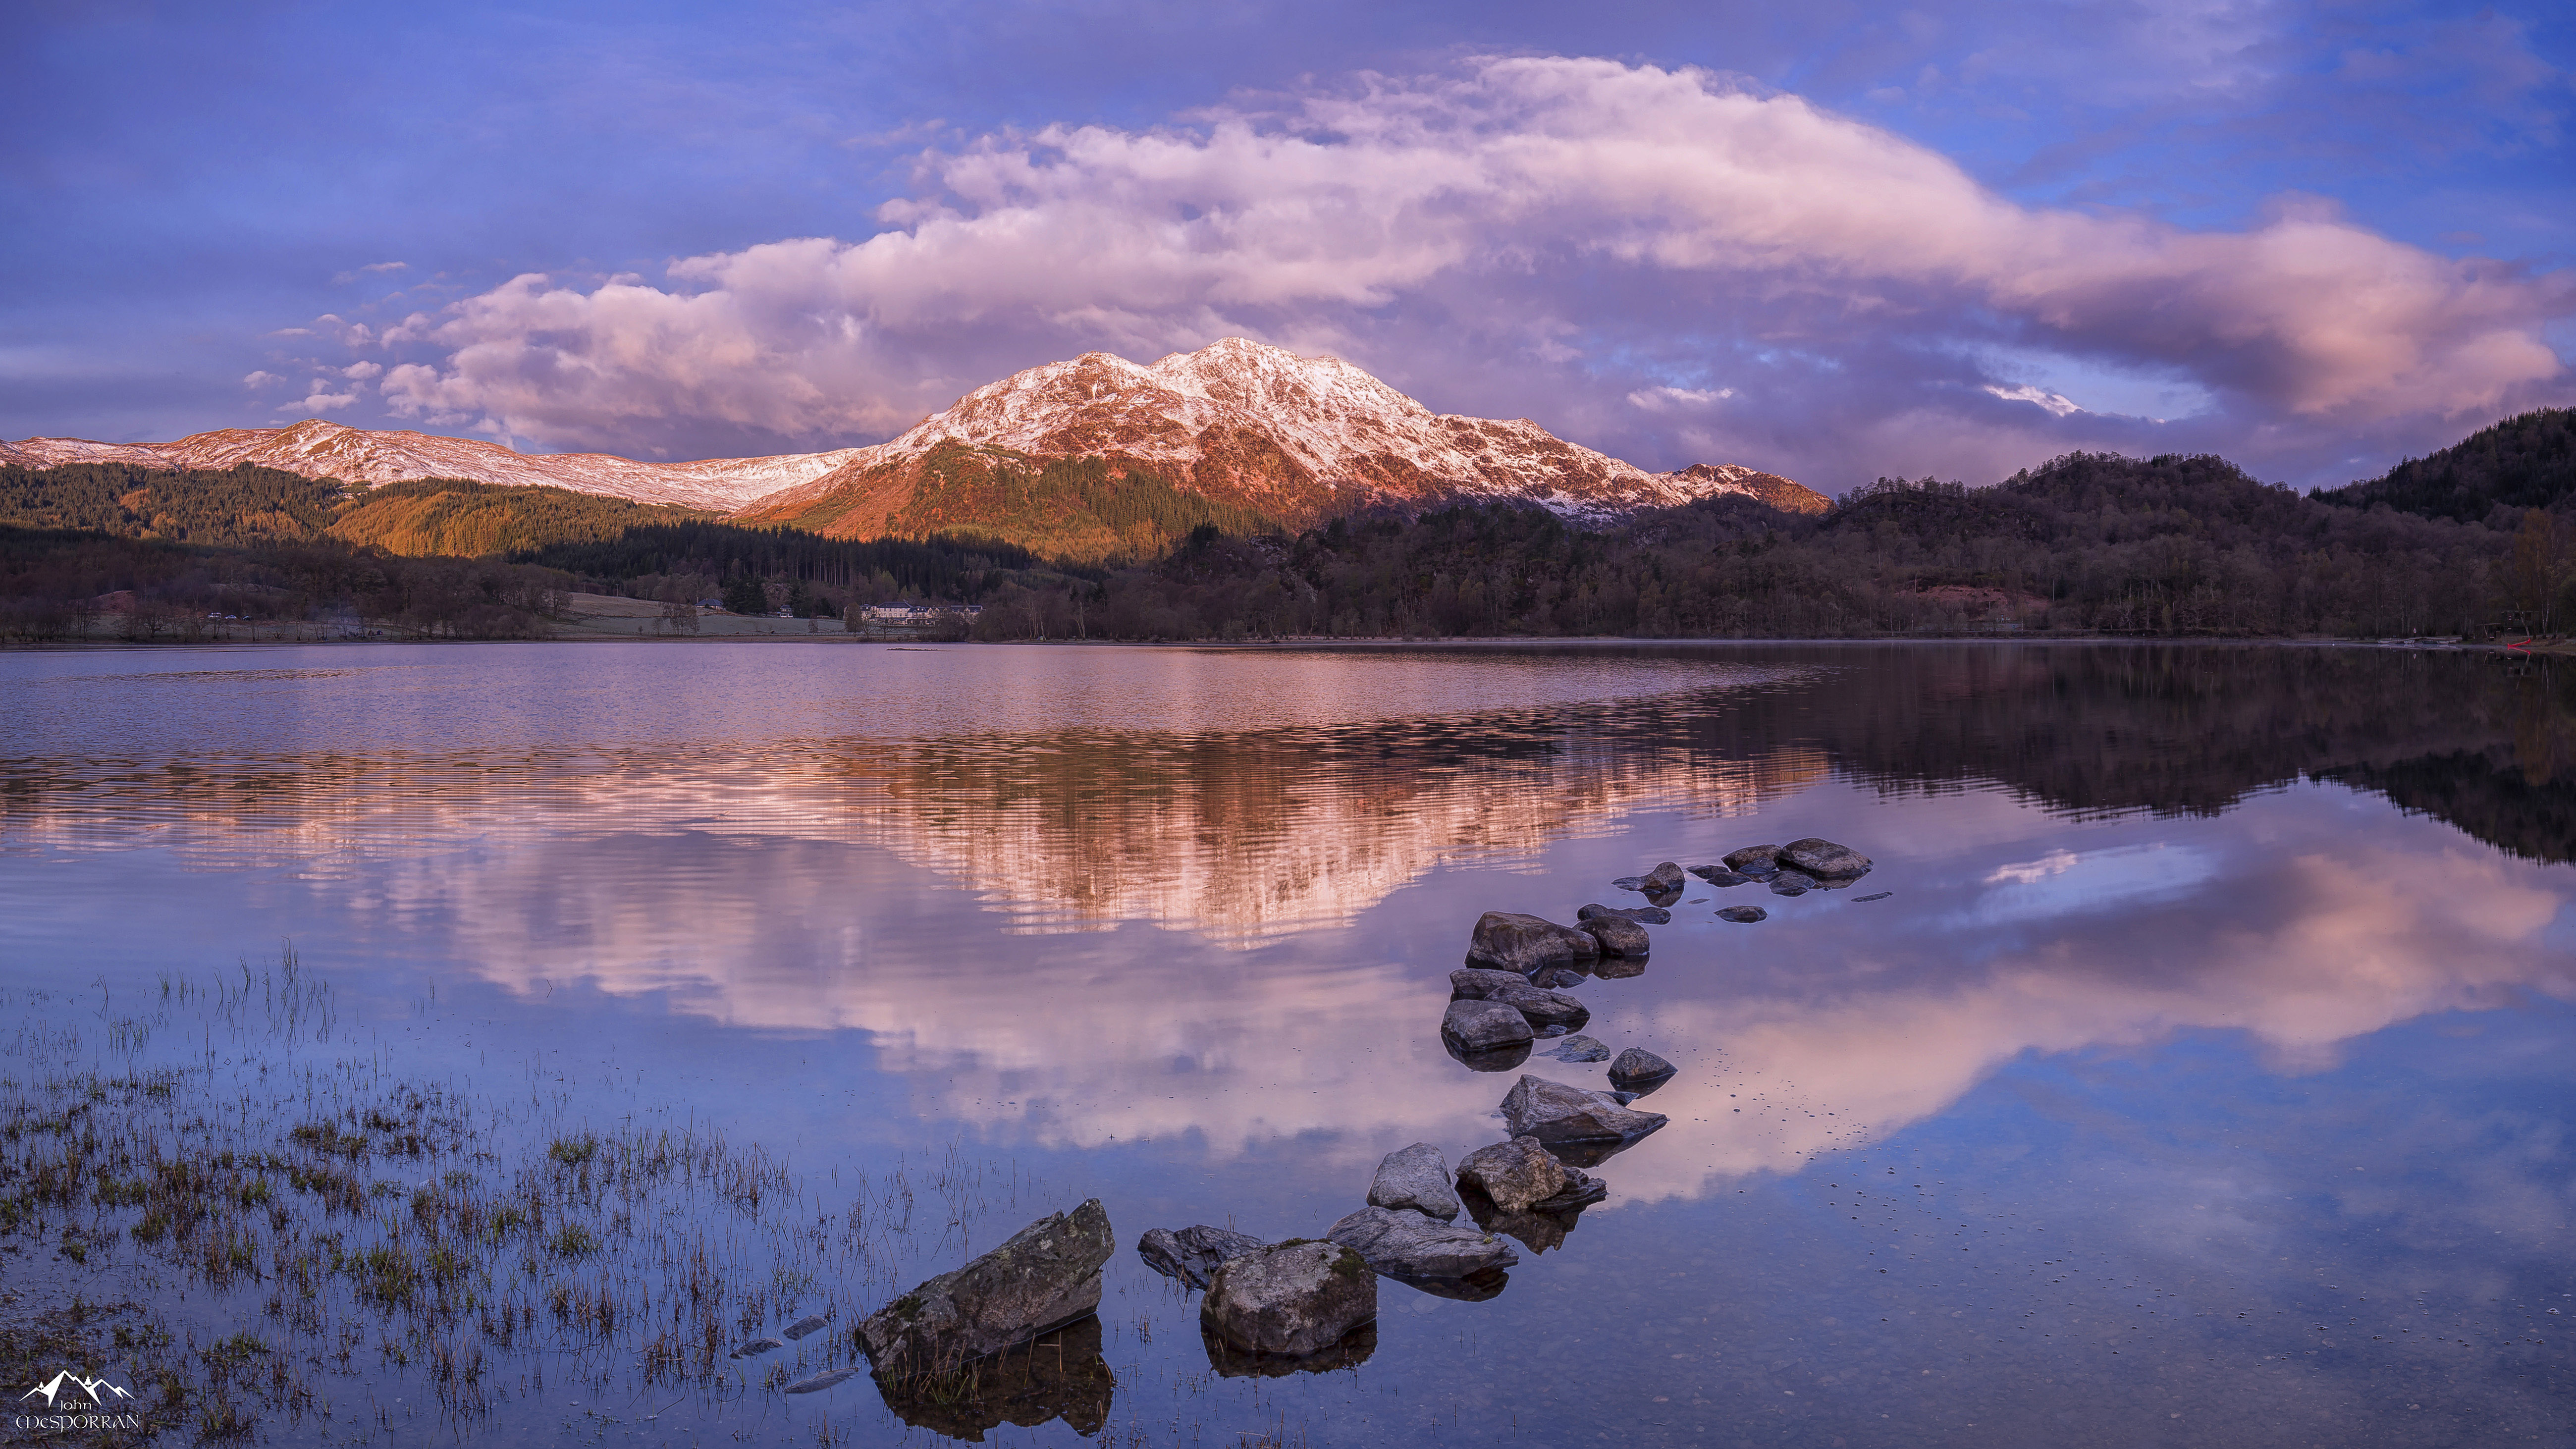 Fall 2016 Wallpaper Sunrise Landscape Photography Scotland Ben Place Over Loch